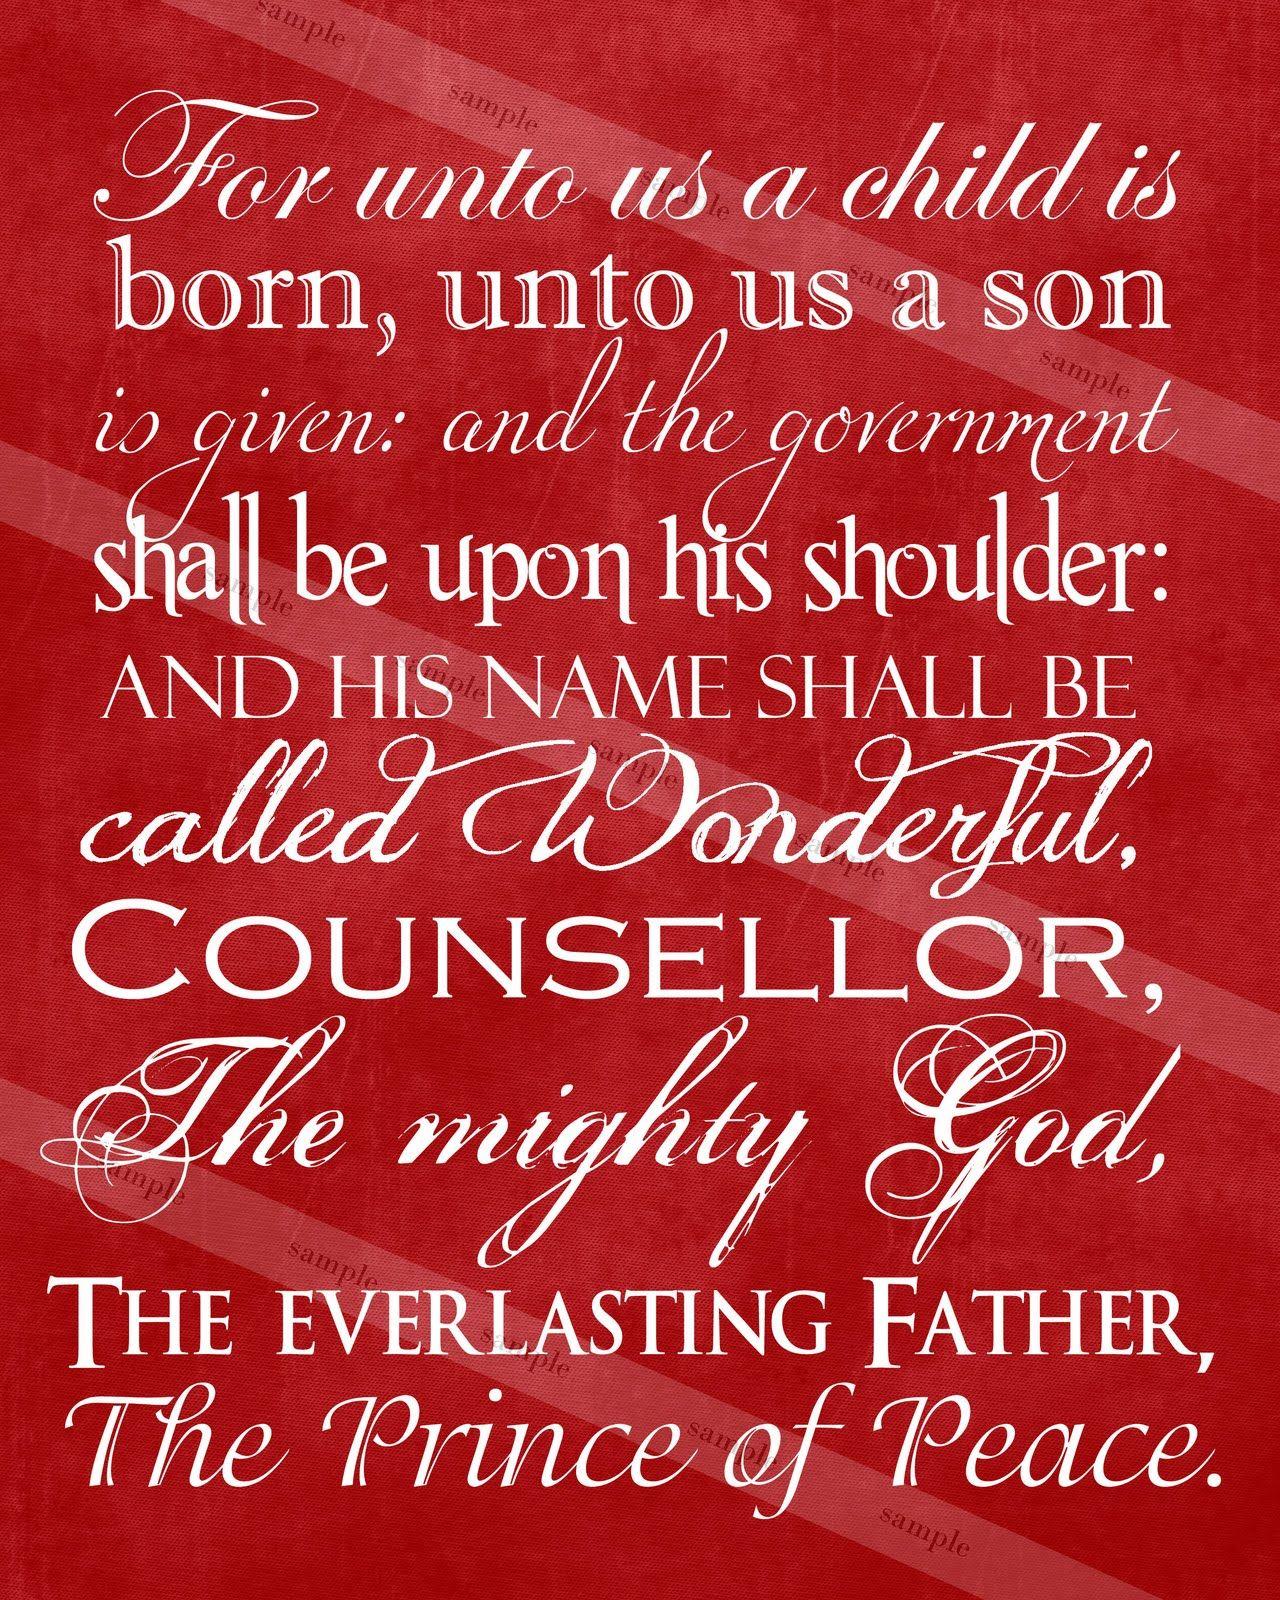 109 Best Christmas Lds Images On Pinterest: A Pocket Full Of LDS Prints: Christmas Scripture Print